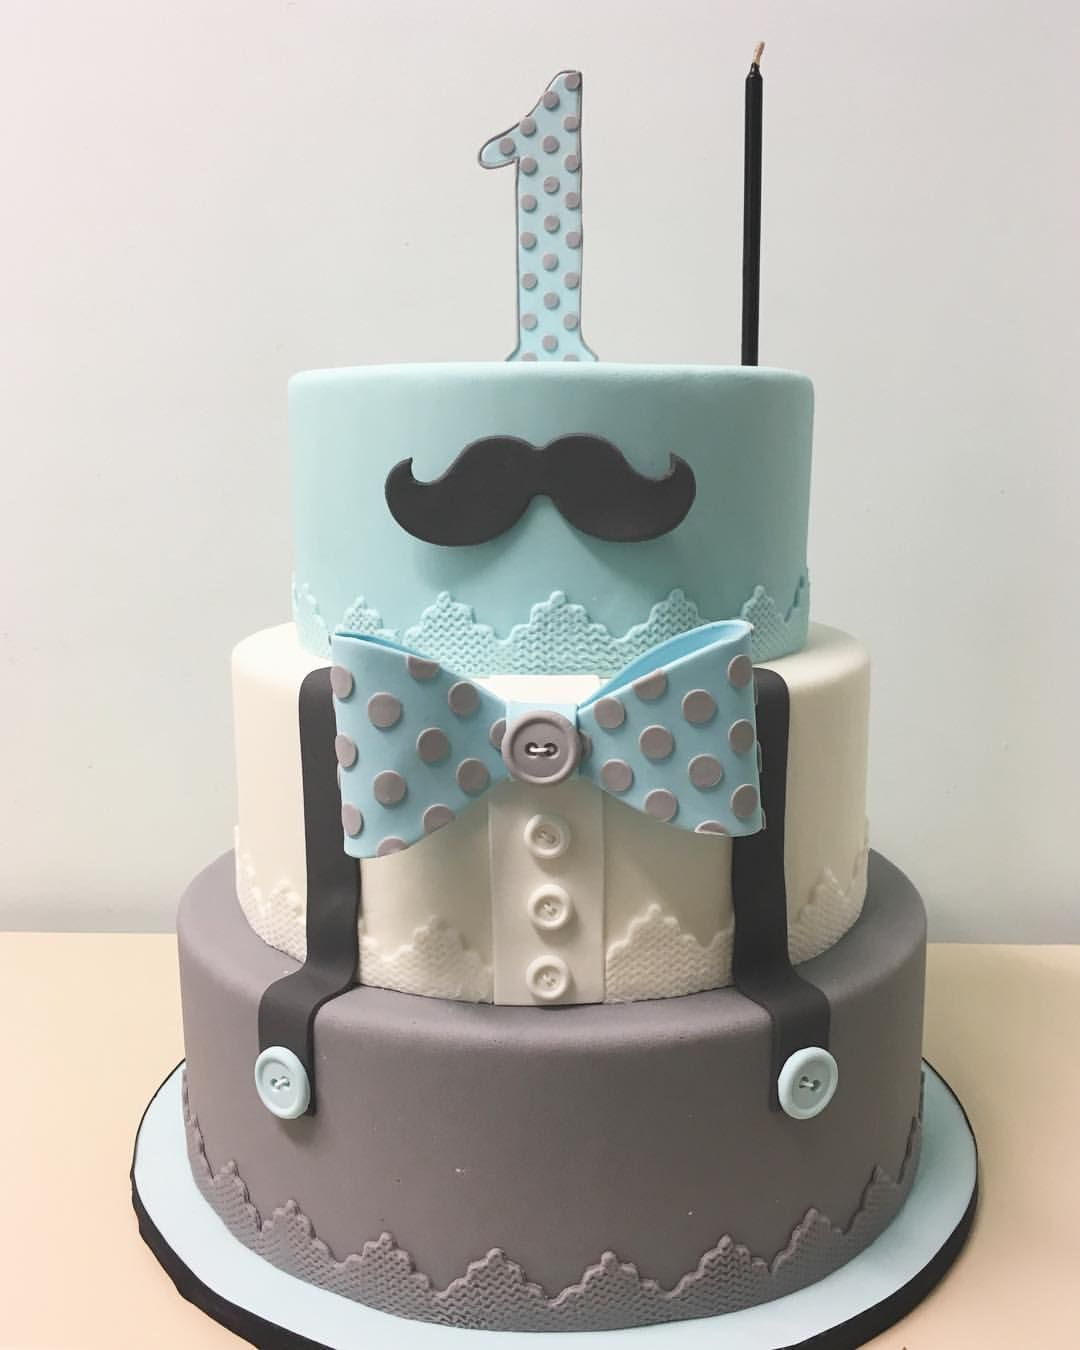 Enjoyable Blue Gray Polka Dot Little Man Cake With Images Baby Birthday Cards Printable Trancafe Filternl